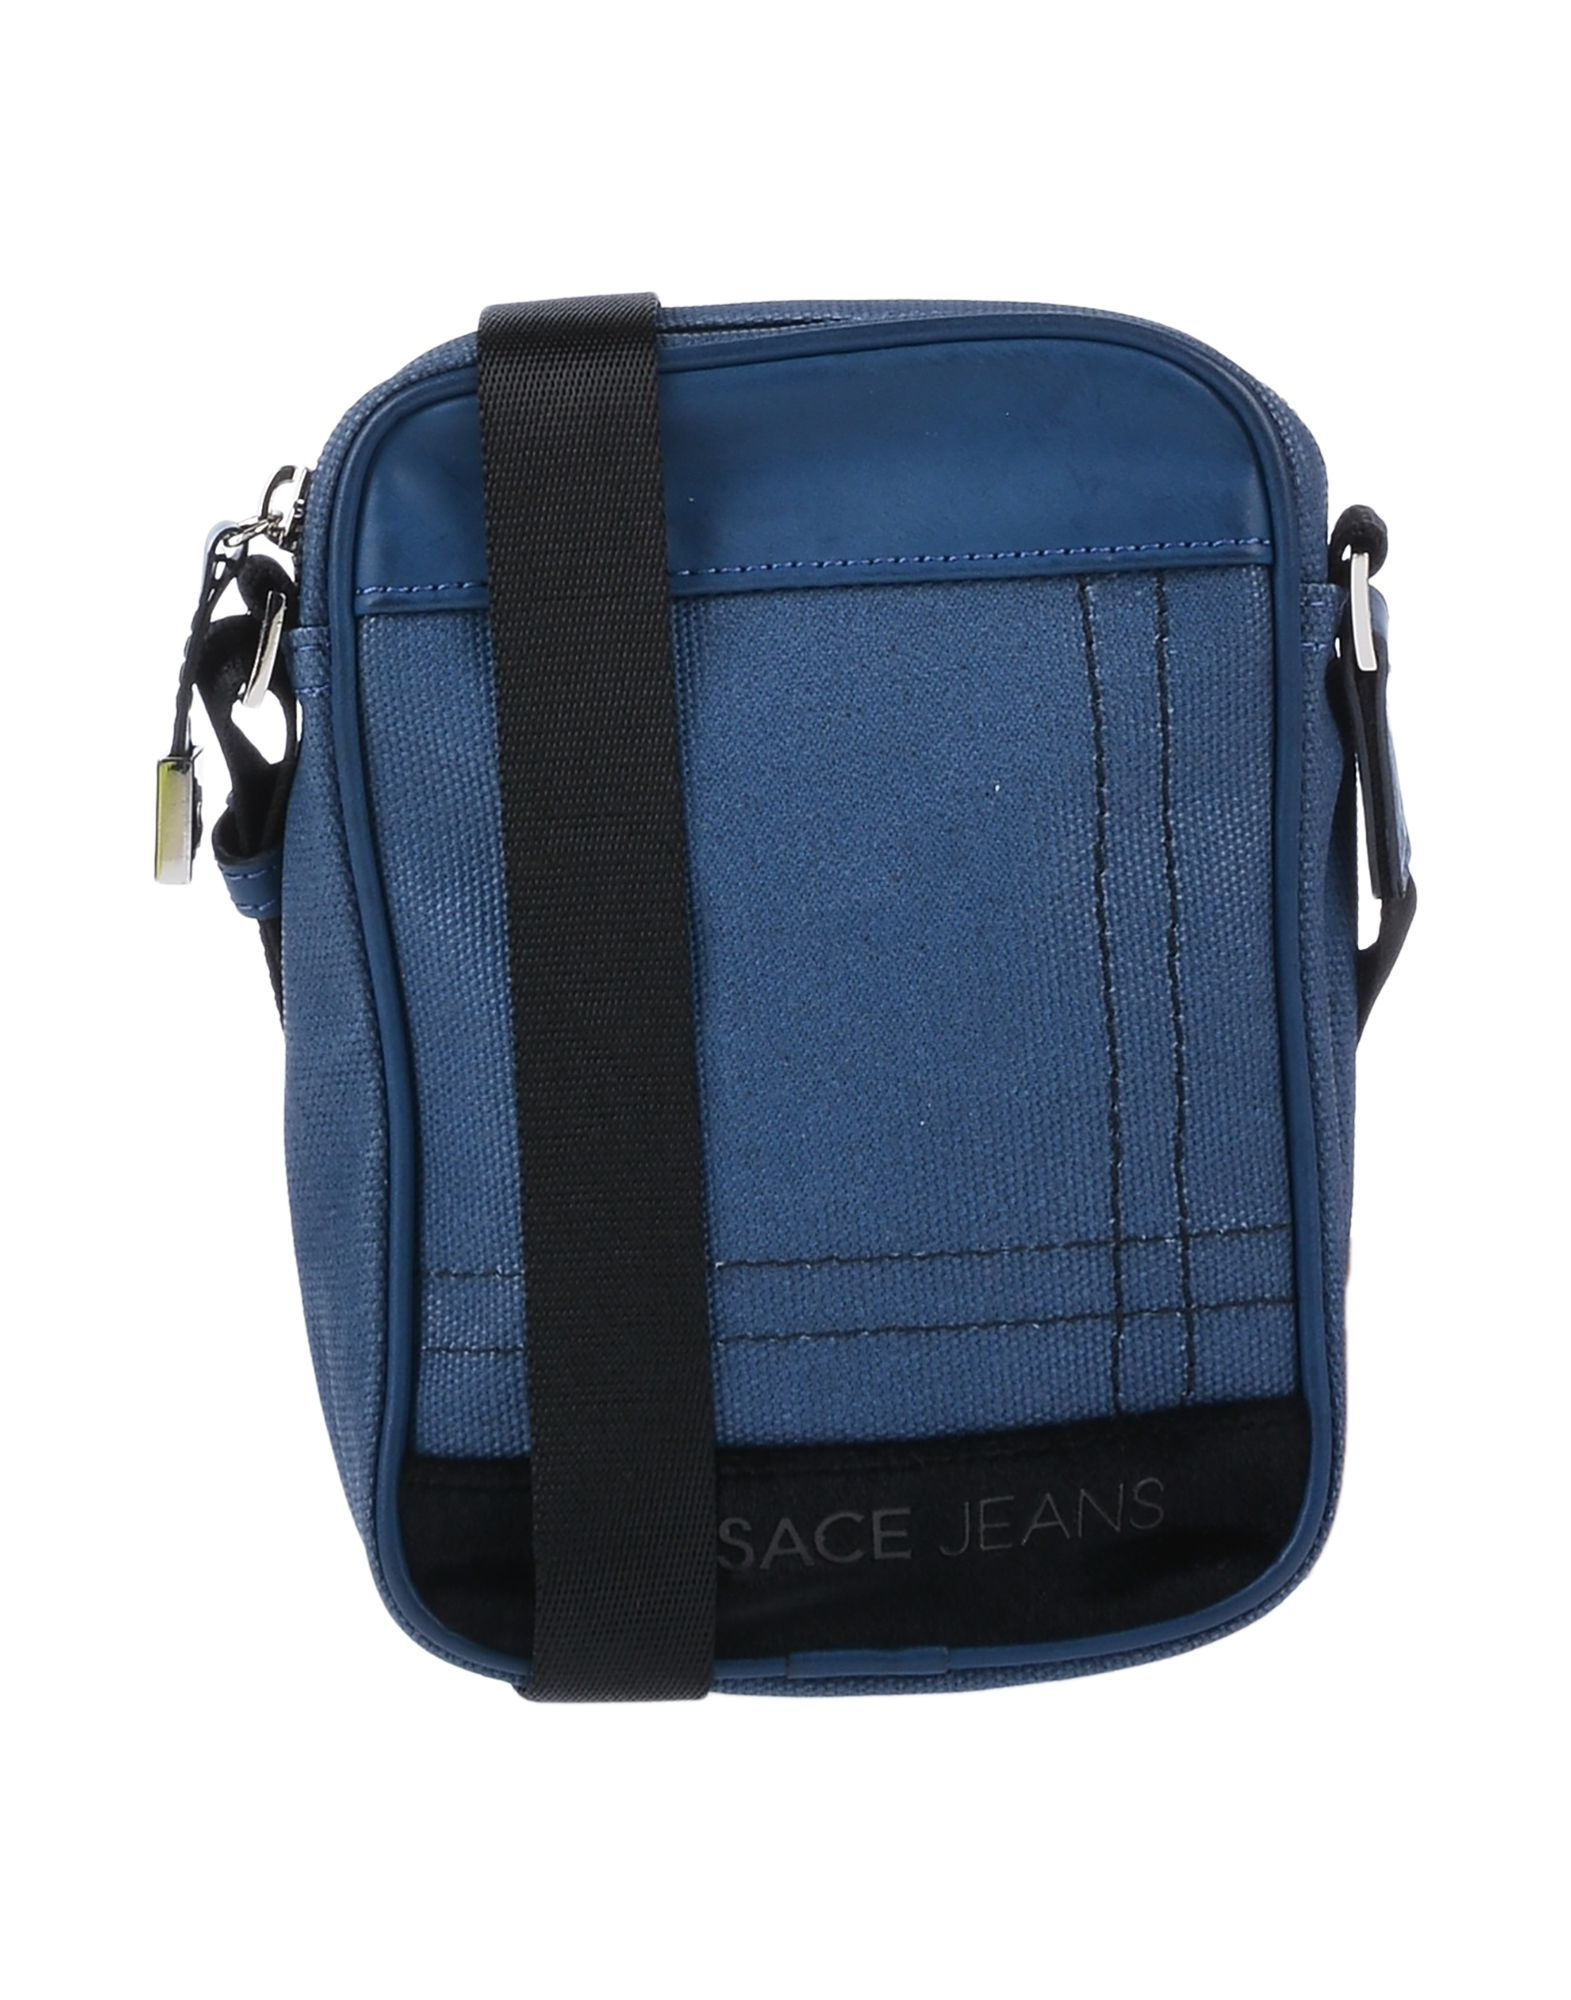 3c68d3bfb1c0 VERSACE JEANS HANDBAGS.  versacejeans  bags  shoulder bags  canvas  velvet   denim